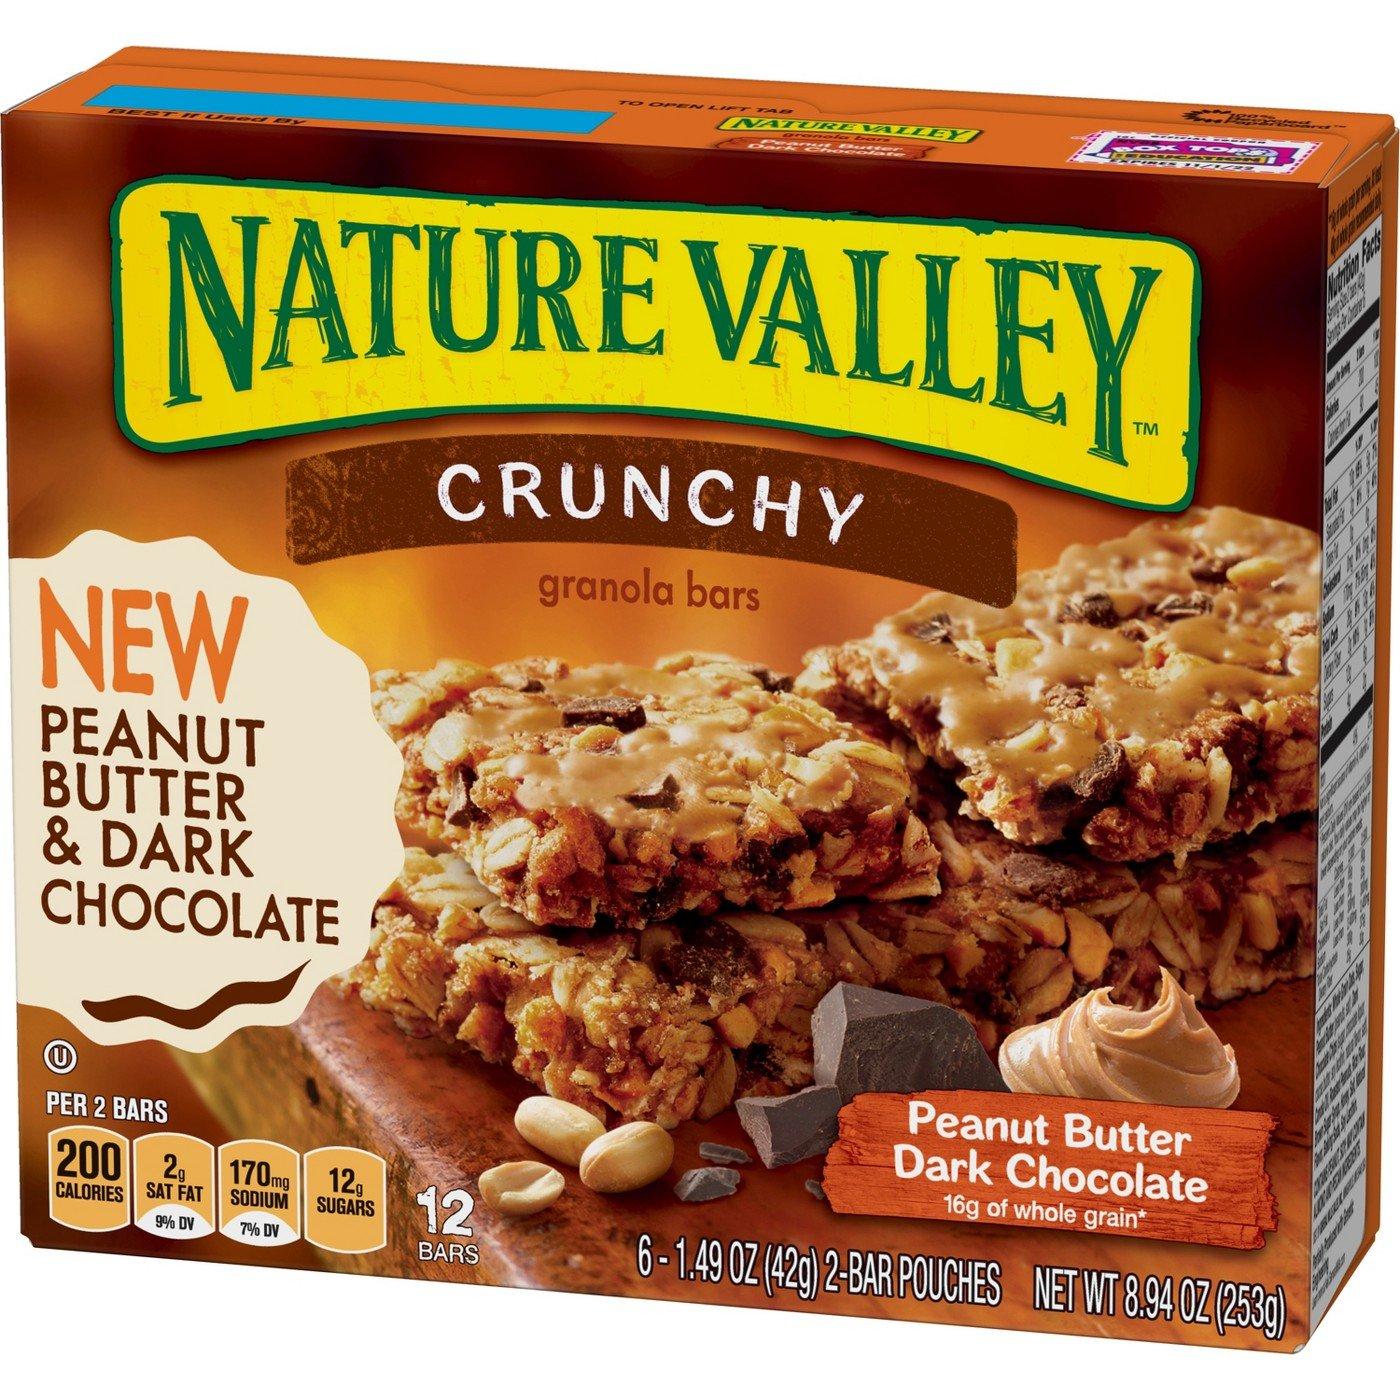 Nature Valley Peanut Butter Dark Chocolate Crunchy Granola Bars - 8.94oz, pack of 1